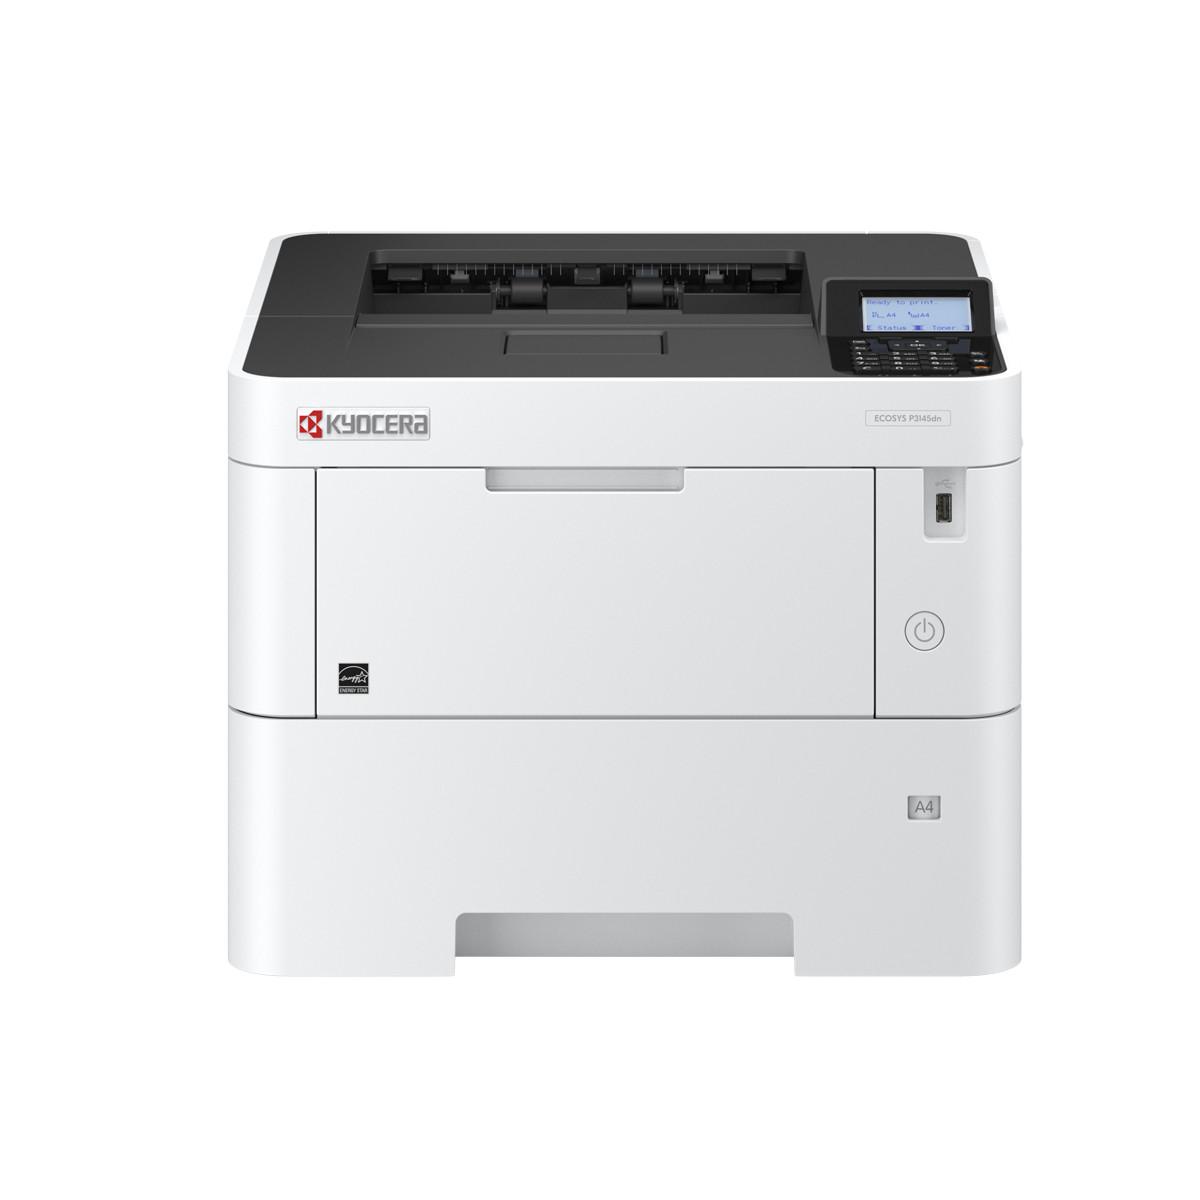 Impressora Kyocera Ecosys P3145DN | Laser Monocromática com USB